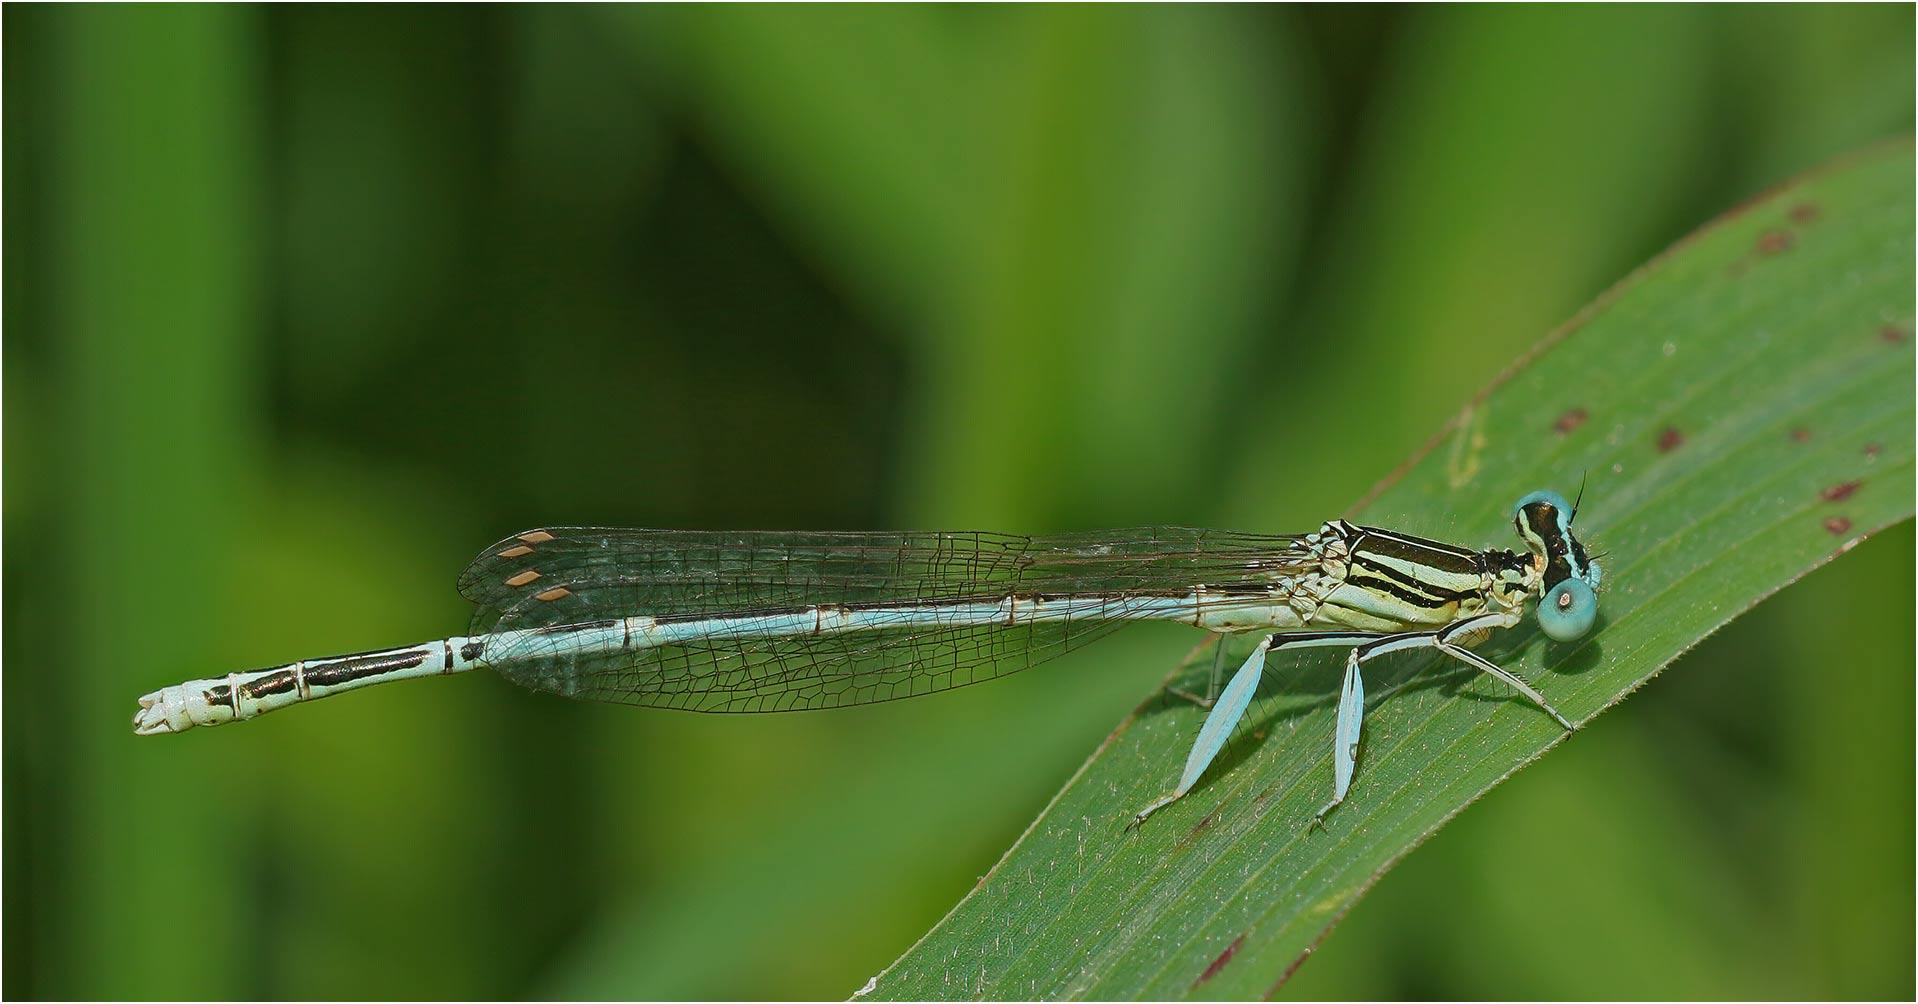 Platycnemis pennipes mâle, Villemur-sur-Tarn, 17/07/2019